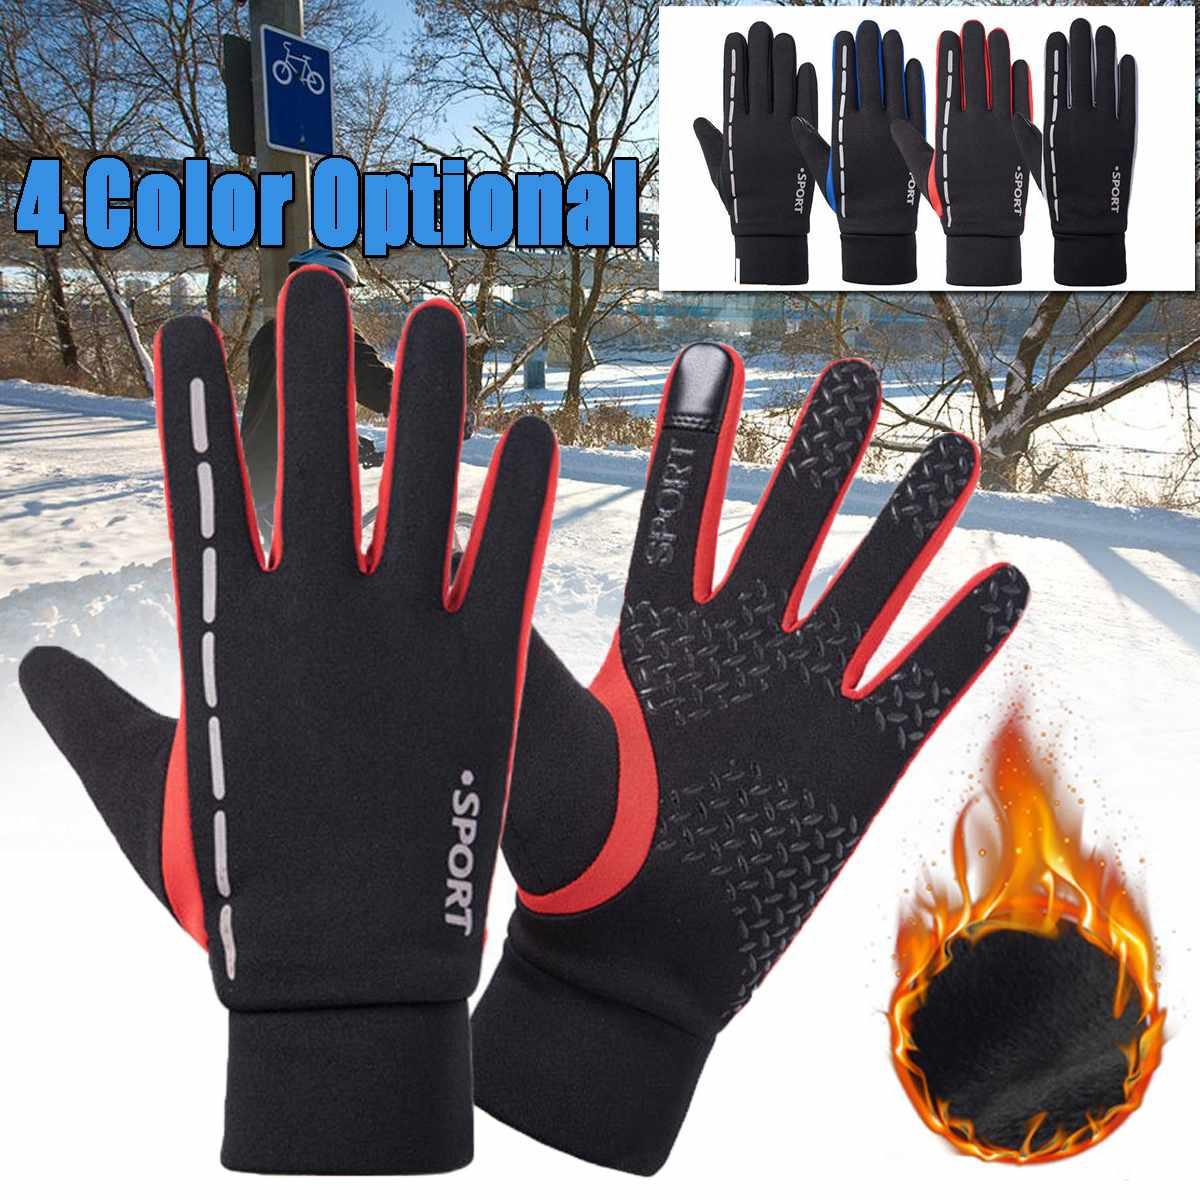 Cycling Gloves Winter Warm Outdoor Anti-slip Touch Screen Wind-proof Waterproof